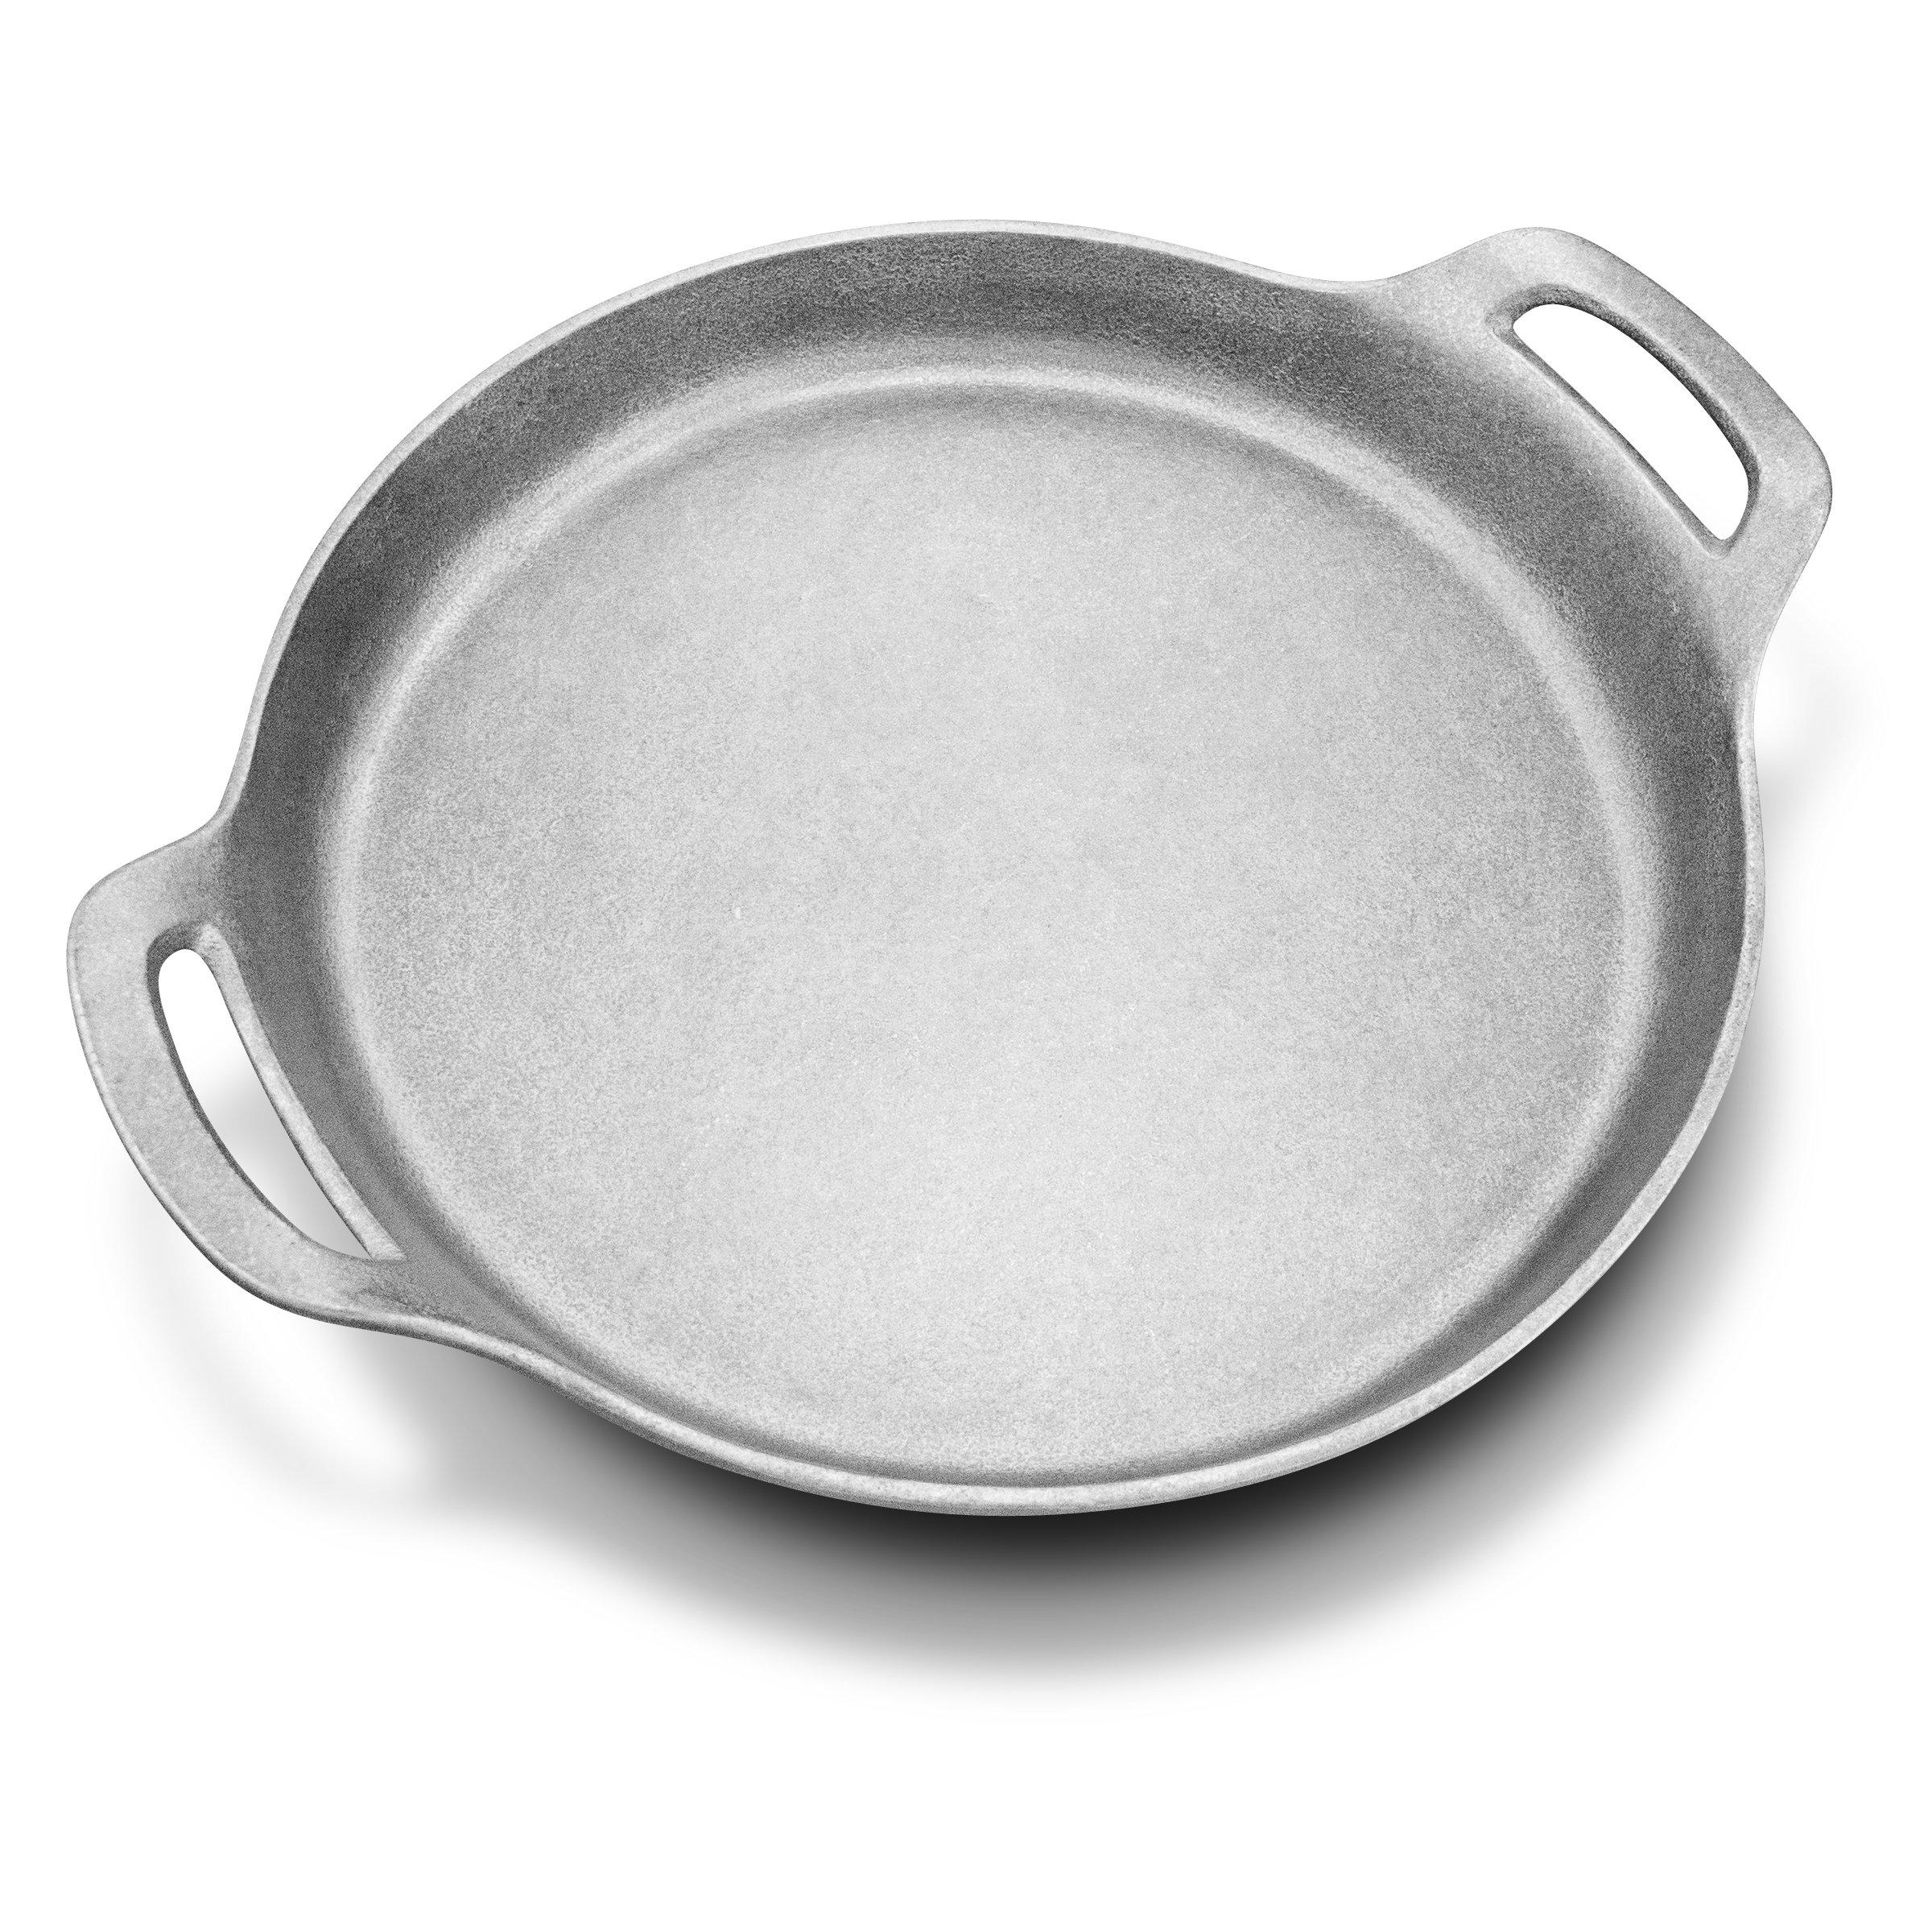 Wilton Armetale Gourmet Grillware Round Sauté Pan with Handles, 13.5-Inch